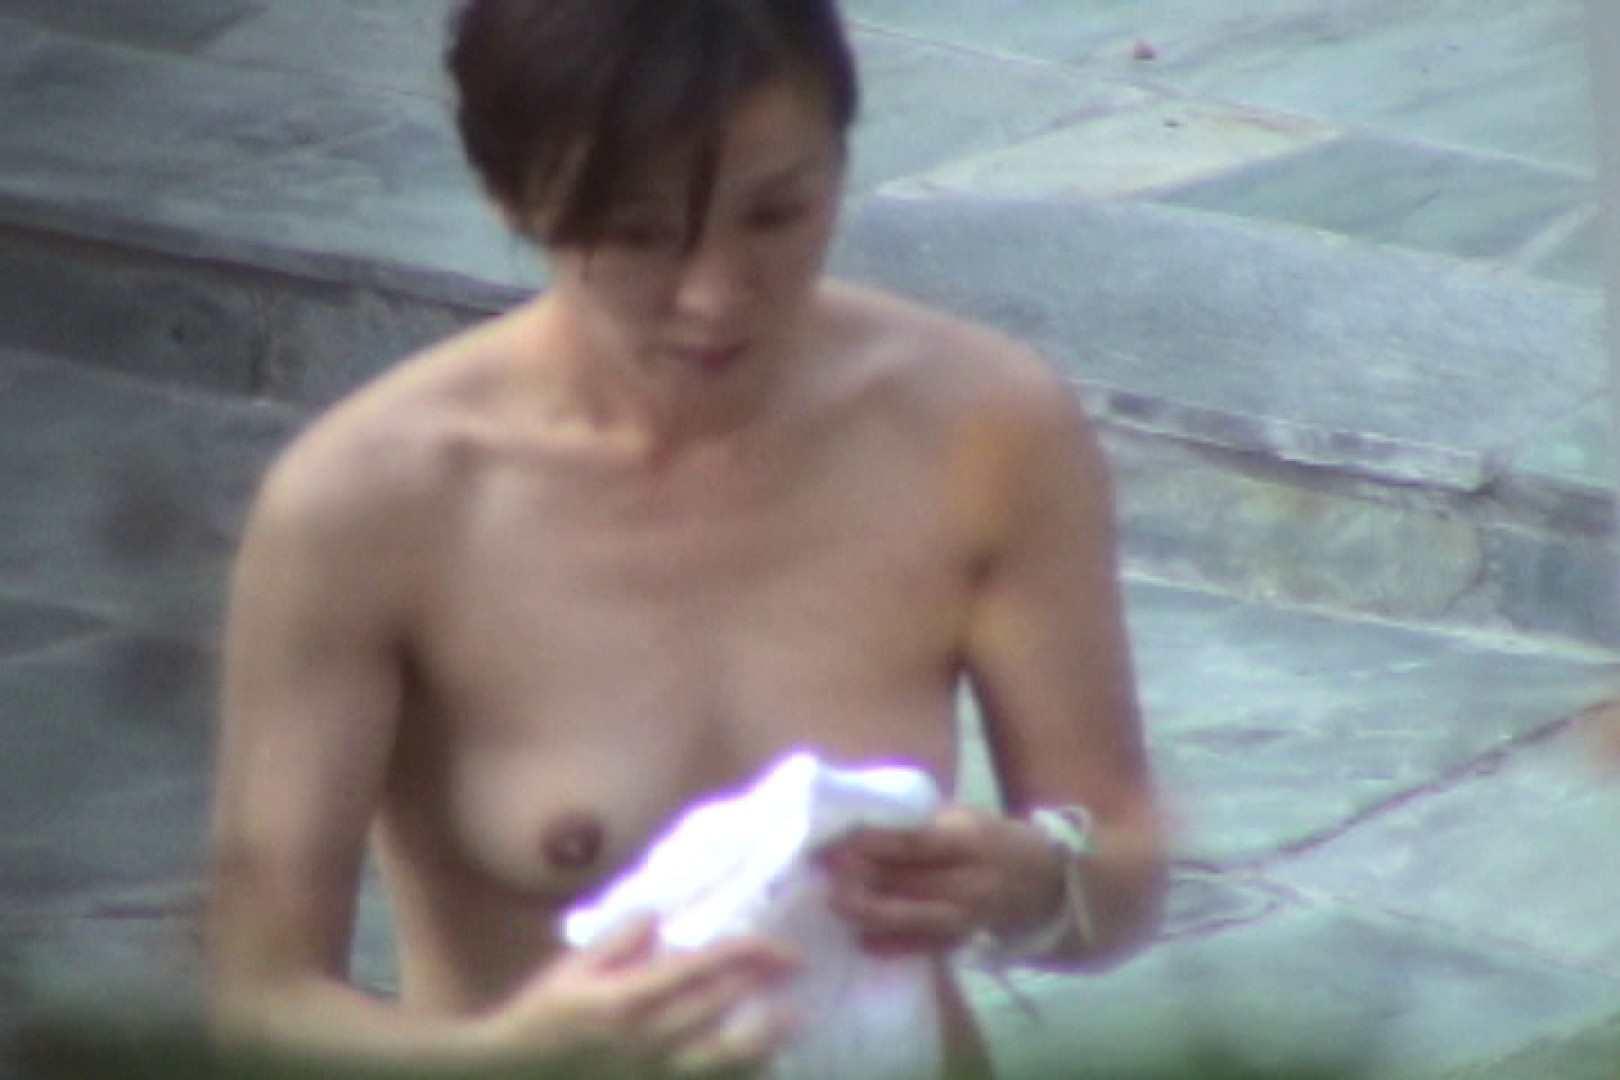 Aquaな露天風呂Vol.456 盗撮 | HなOL  102pic 2